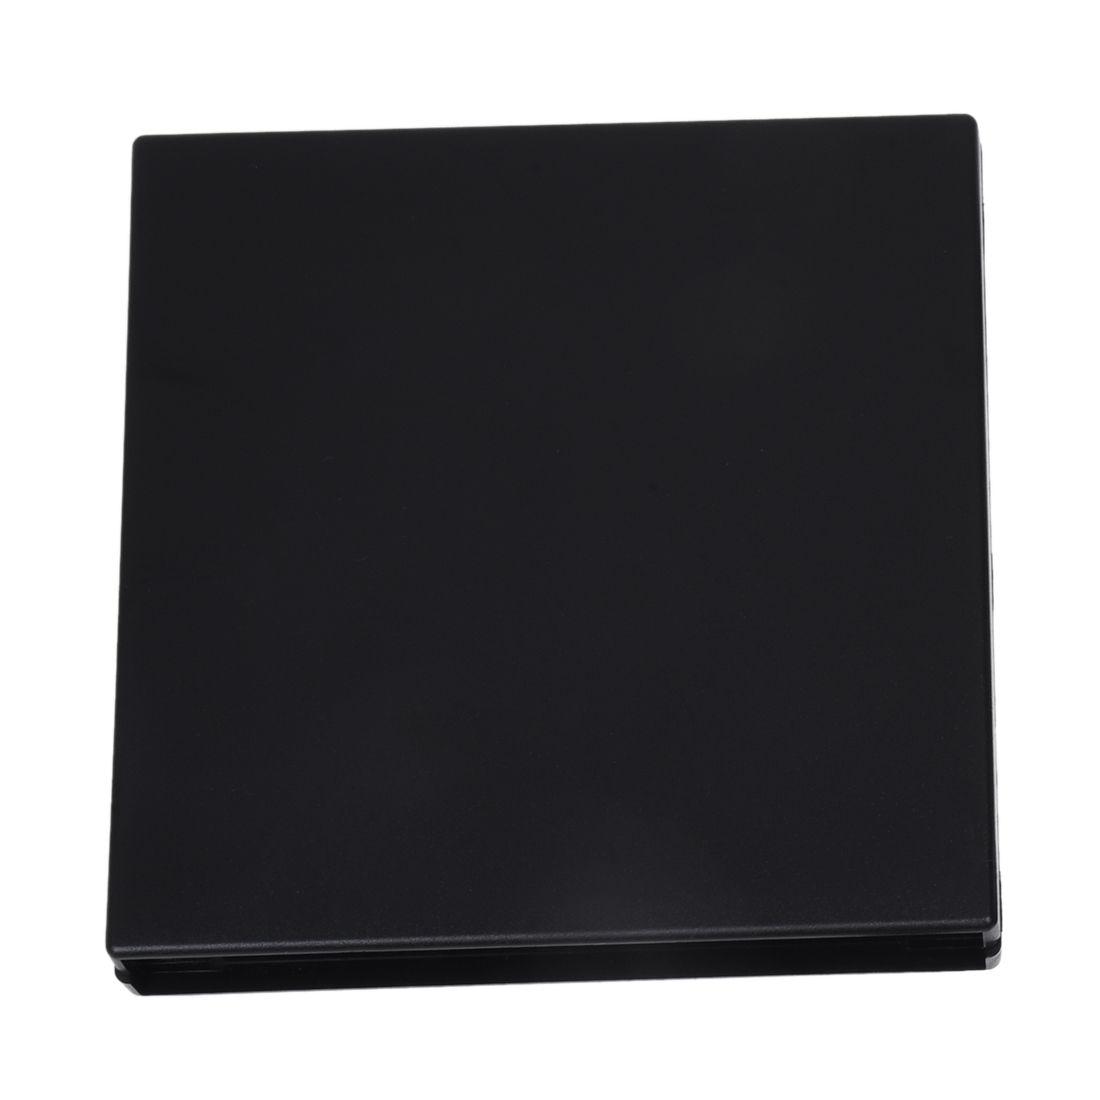 Portátil USB a Sata CD DVD RW cubierta externa Caddy